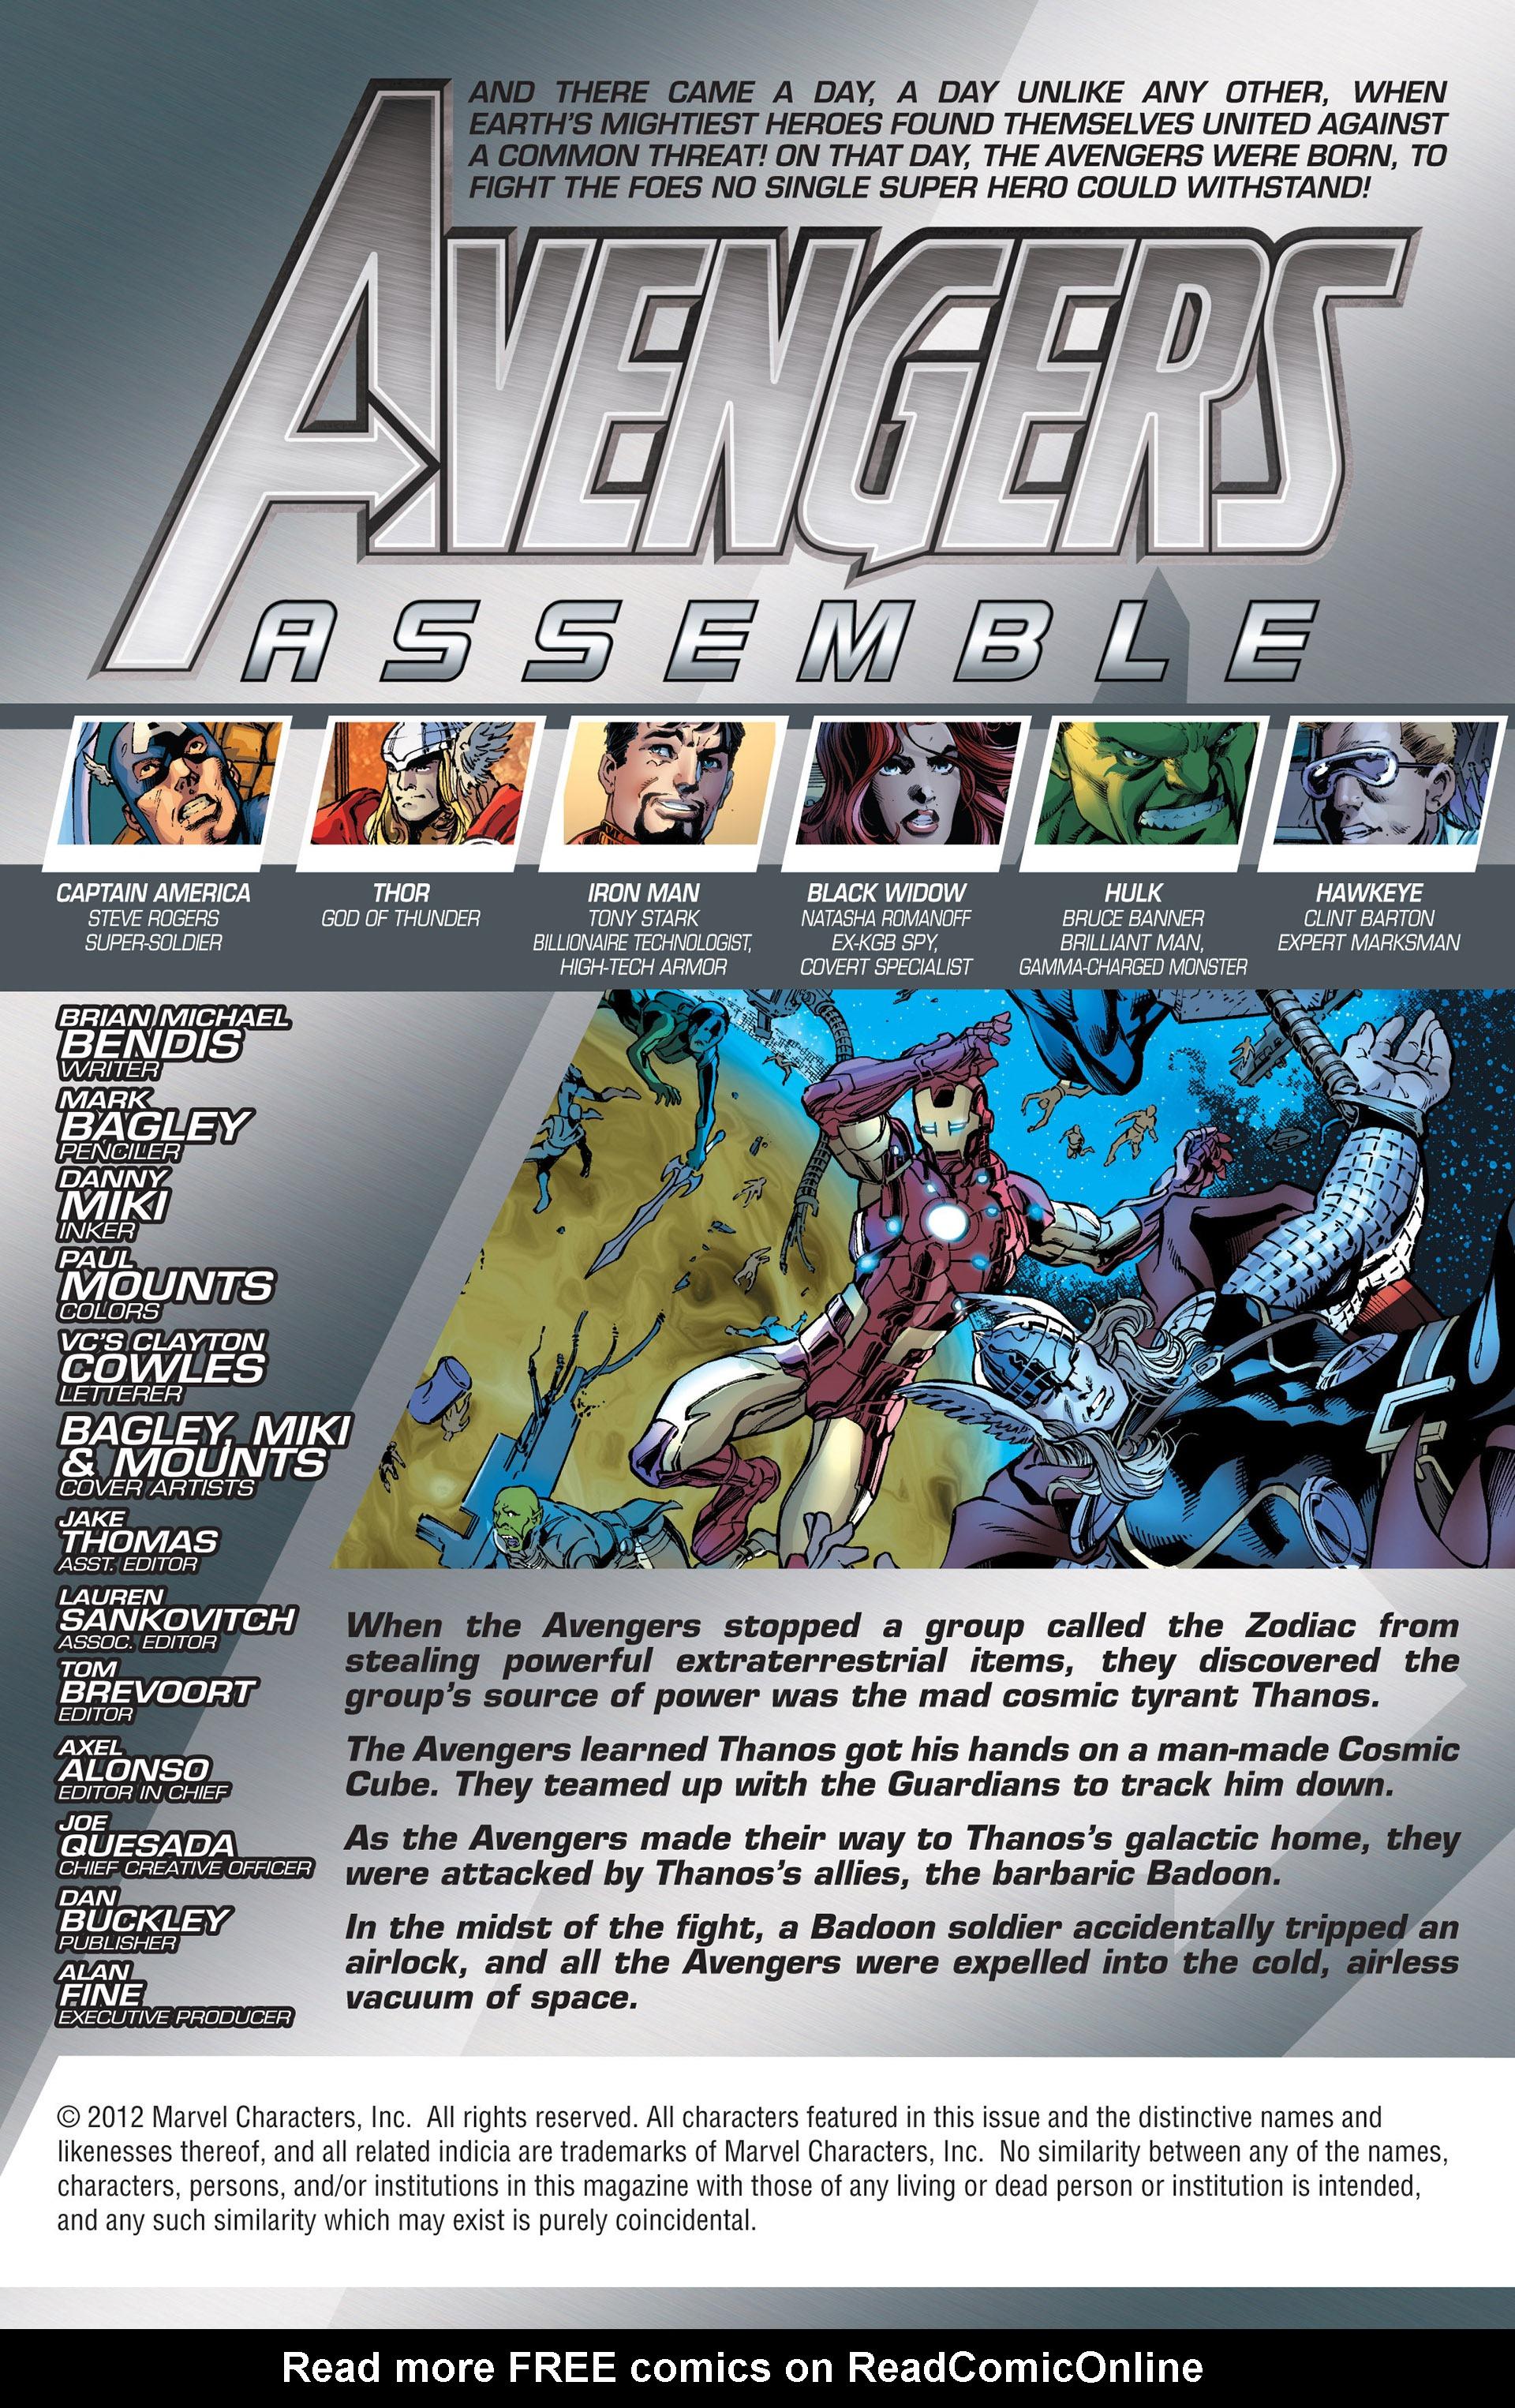 Avengers Assemble (2012) 7 Page 1